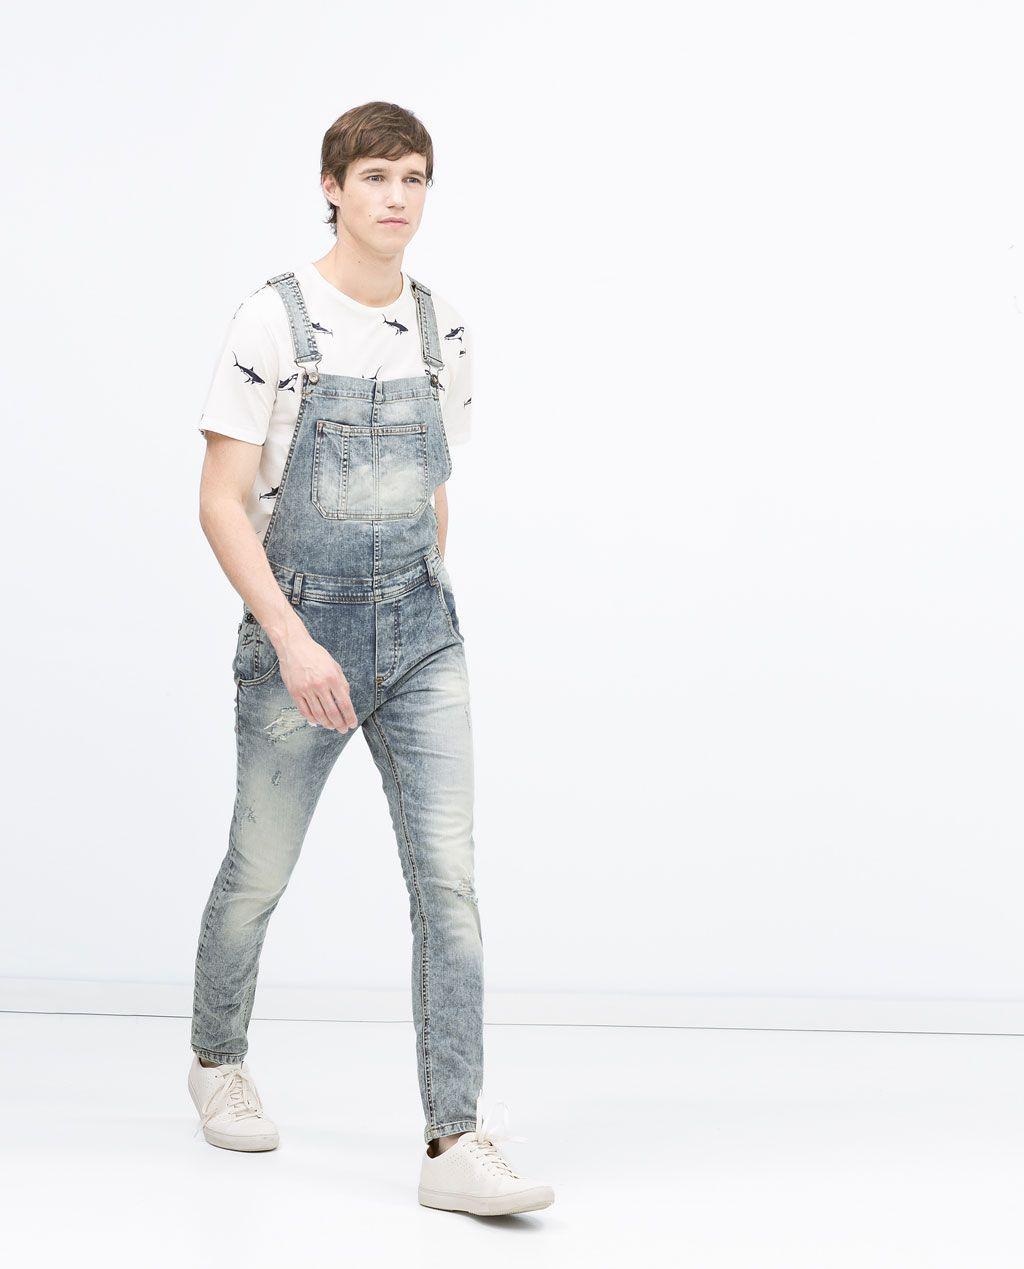 Zara Man Jeans Pantalones De Hombre Moda